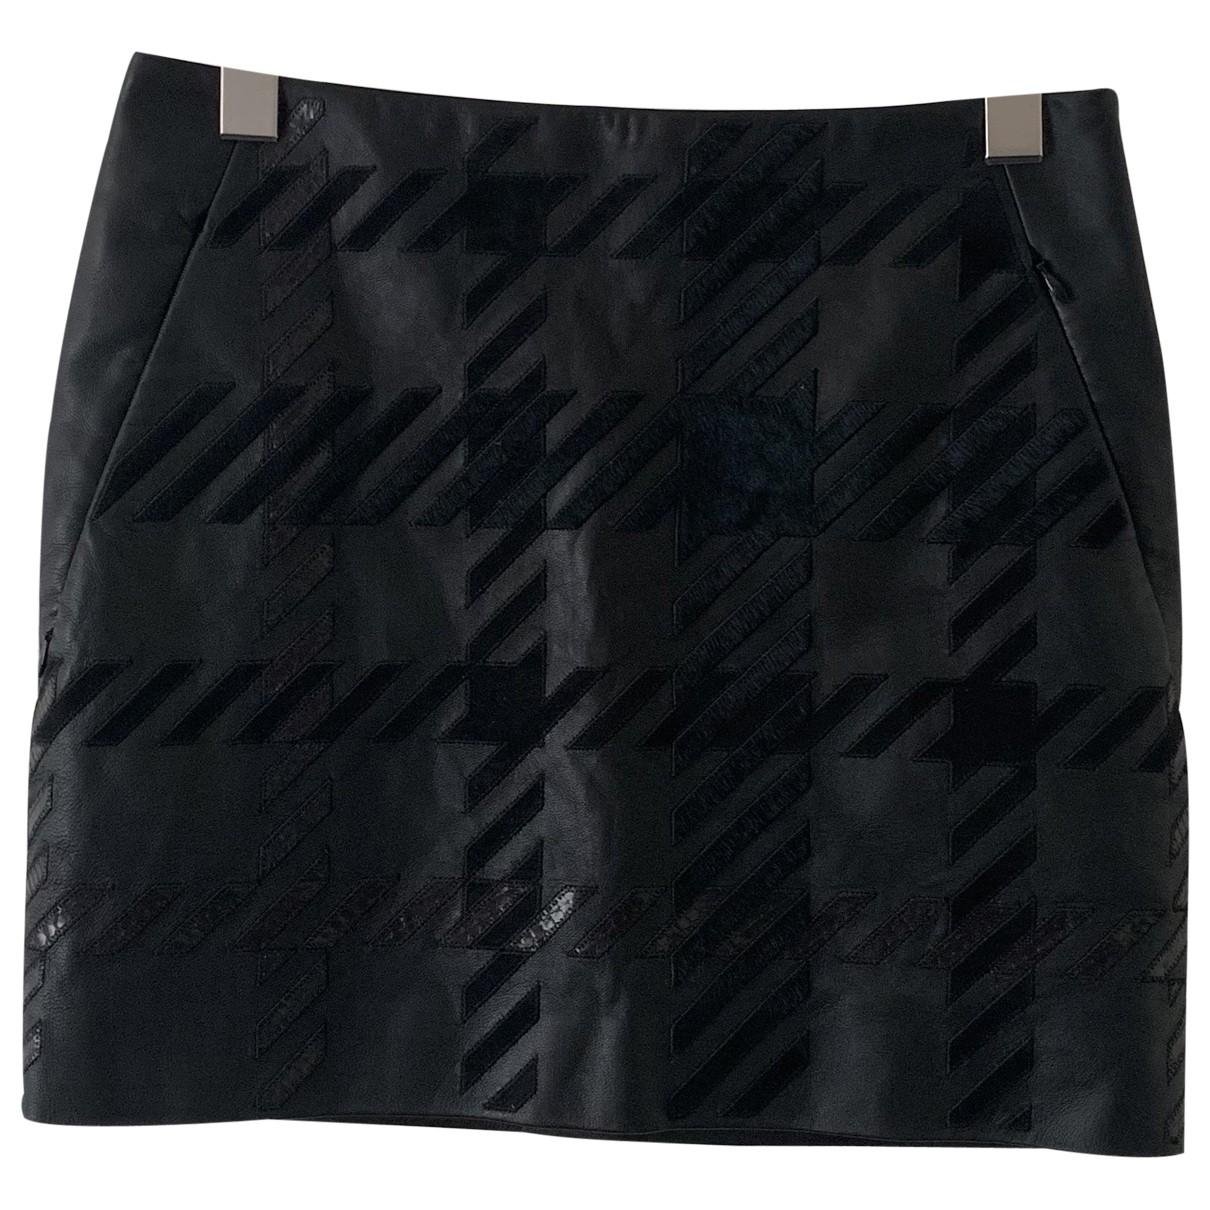 Barbara Bui \N Black Leather skirt for Women 36 FR